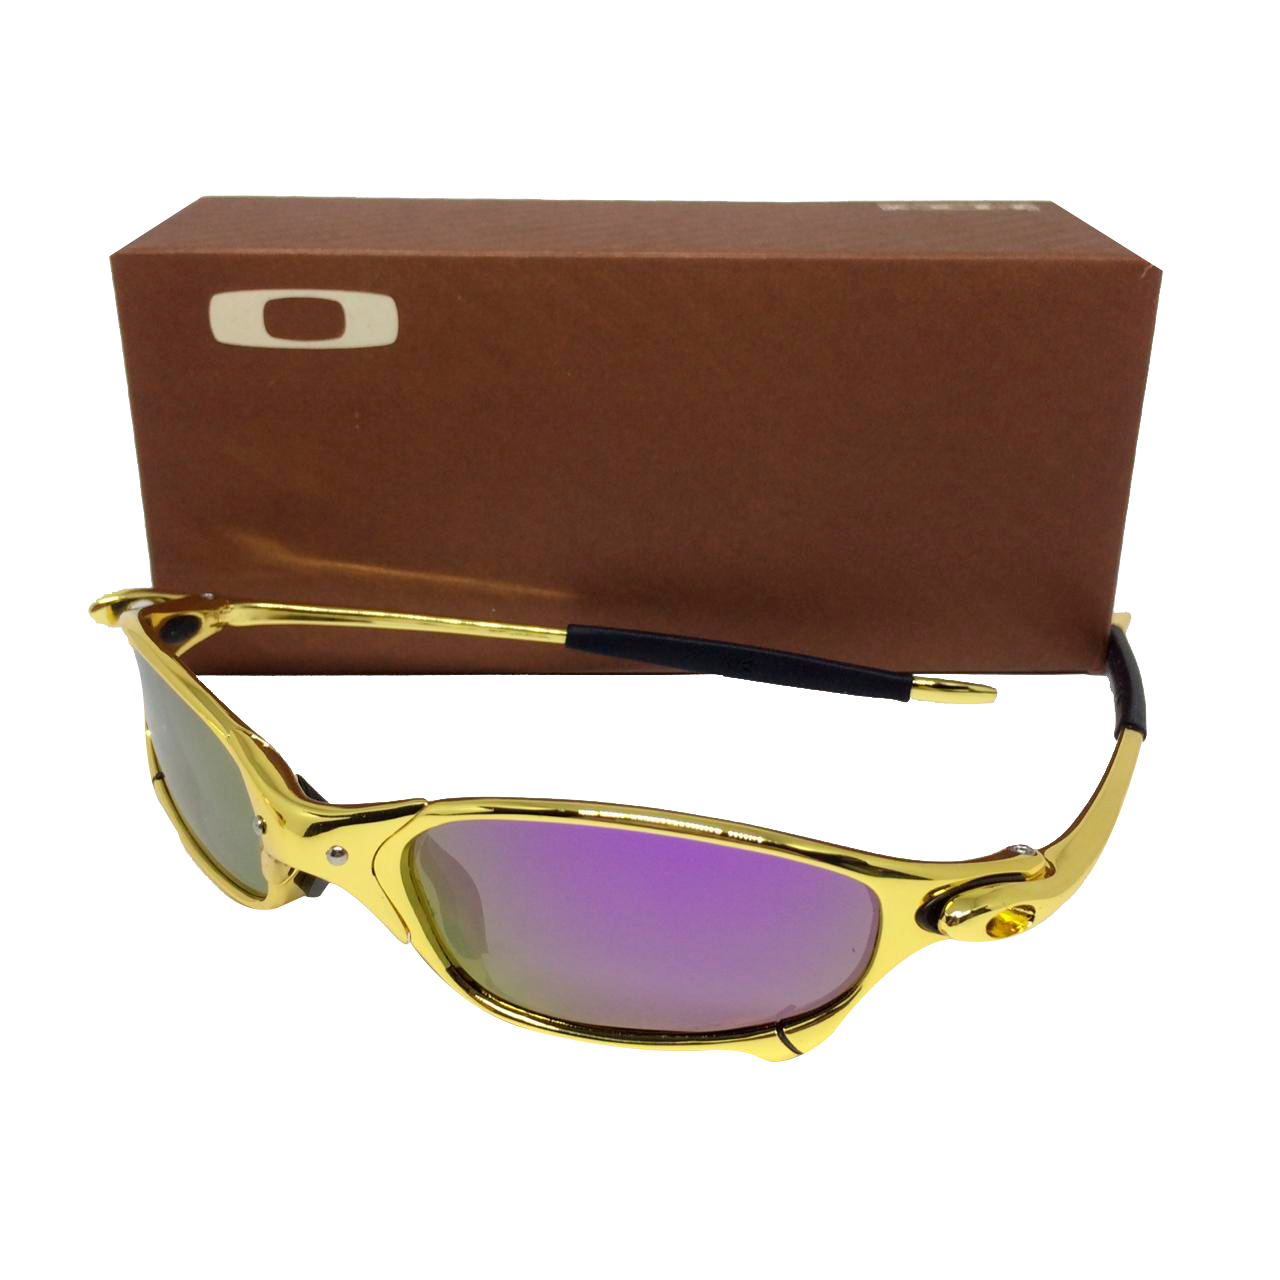 955a65dcb4c8c Óculos Oakley Juliet Gold 24k lente roxa – Sanfer Acessórios